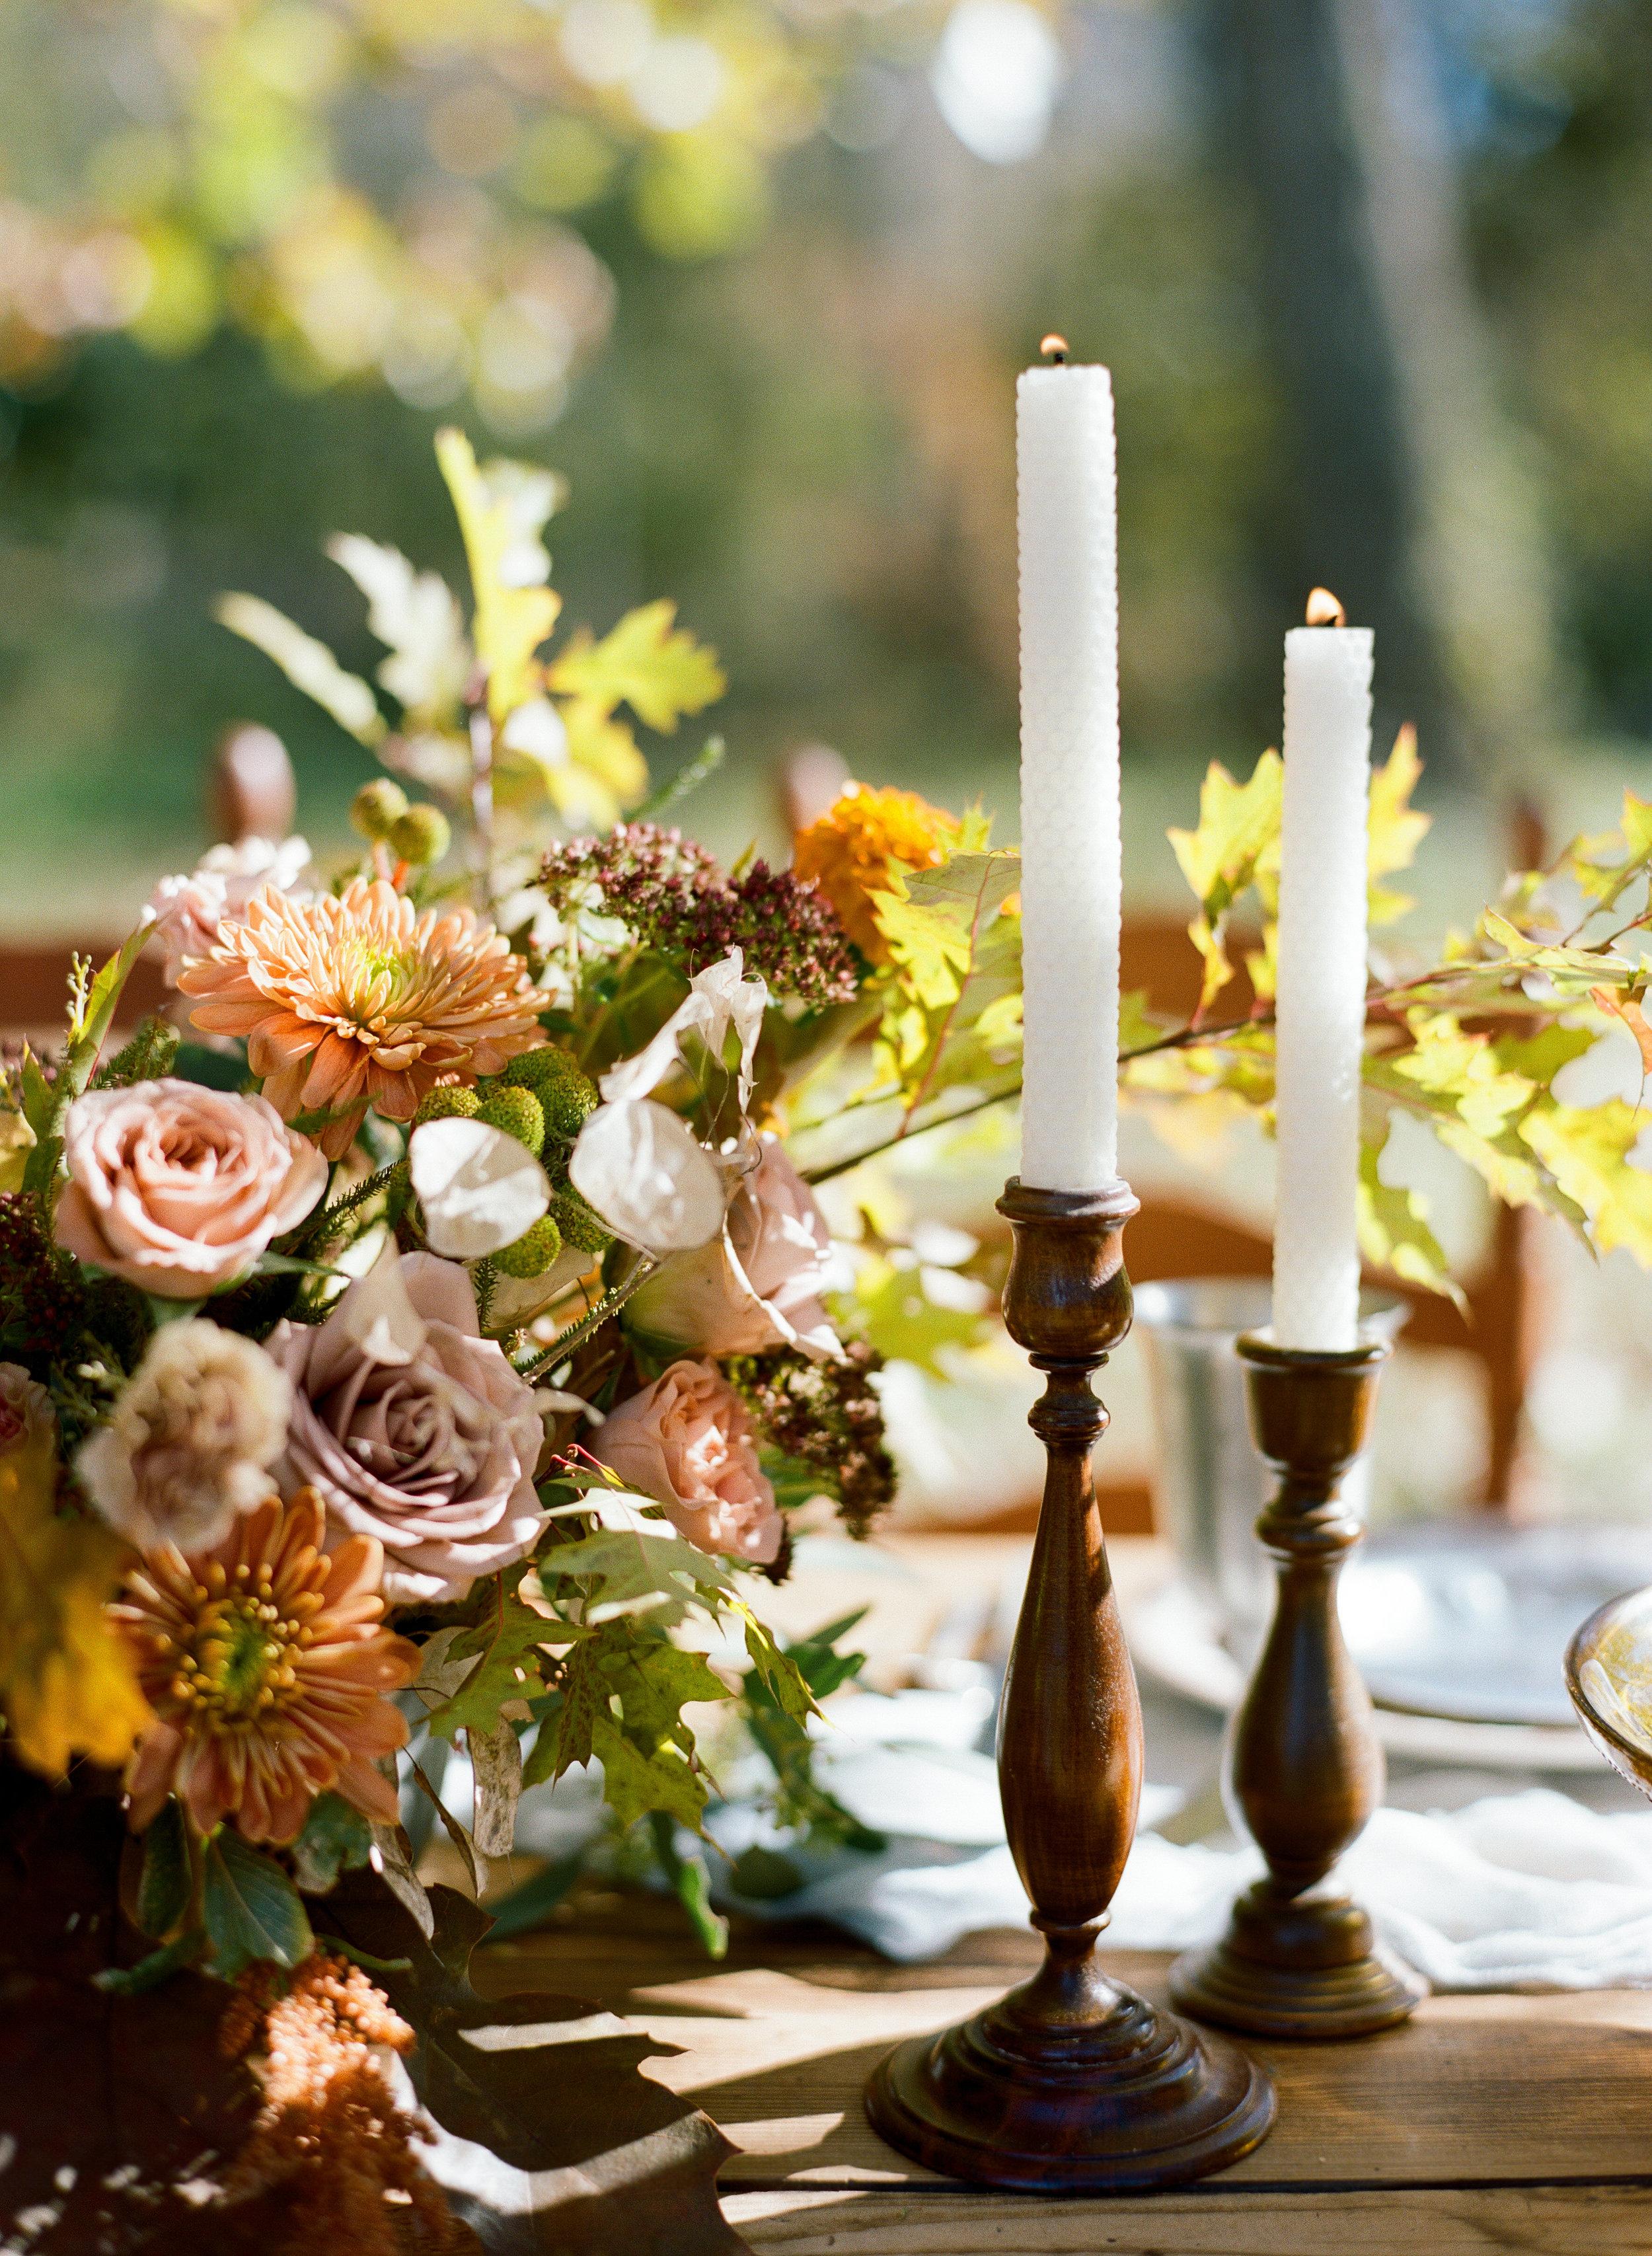 craggy candles.jpg